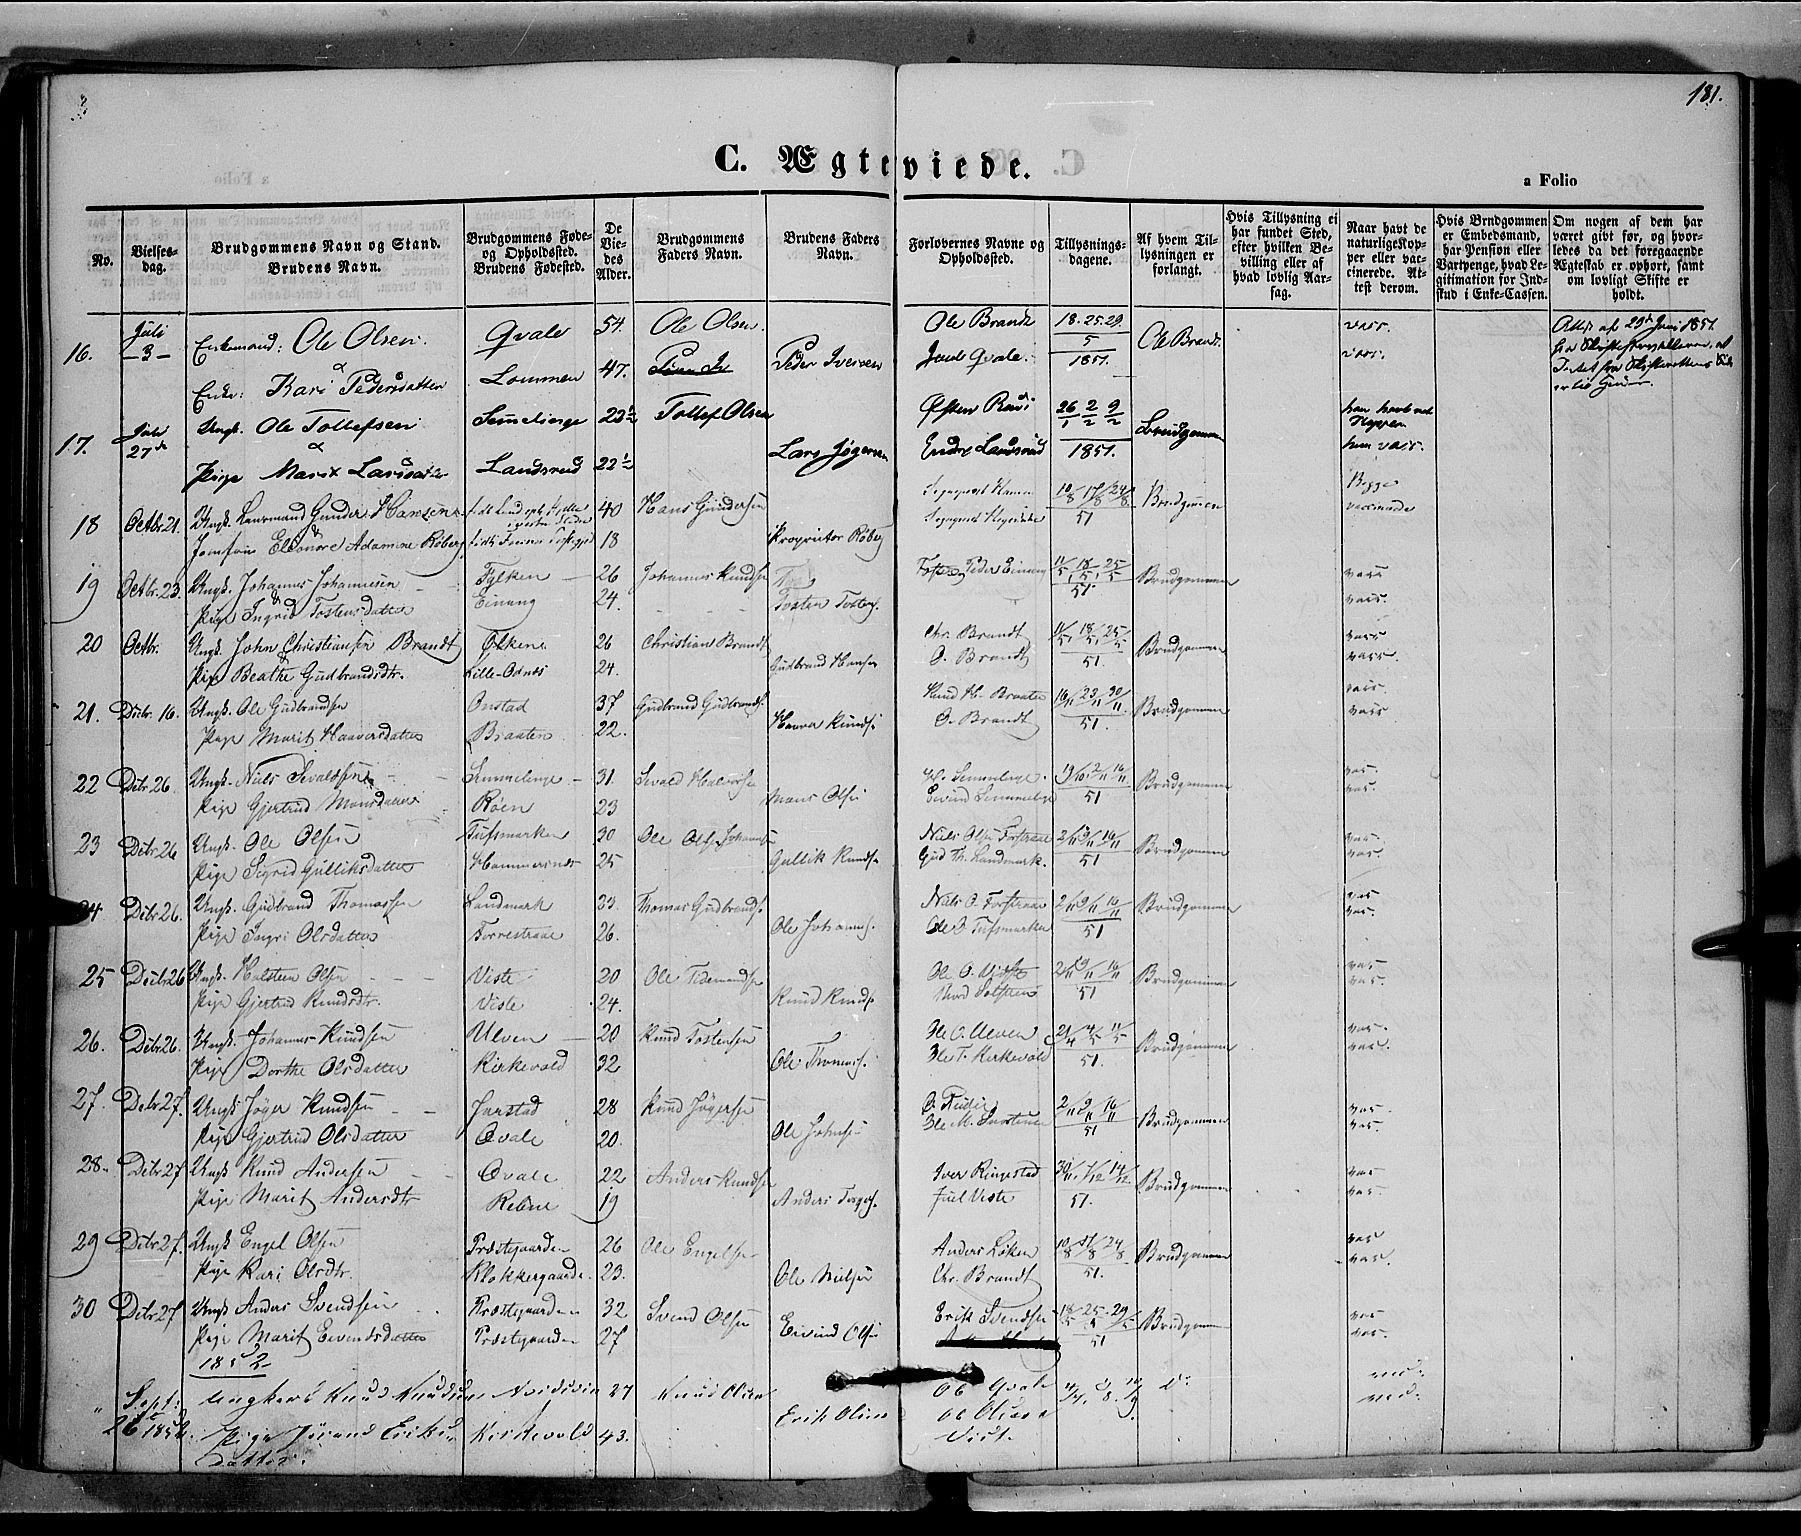 SAH, Vestre Slidre prestekontor, Ministerialbok nr. 1, 1844-1855, s. 181